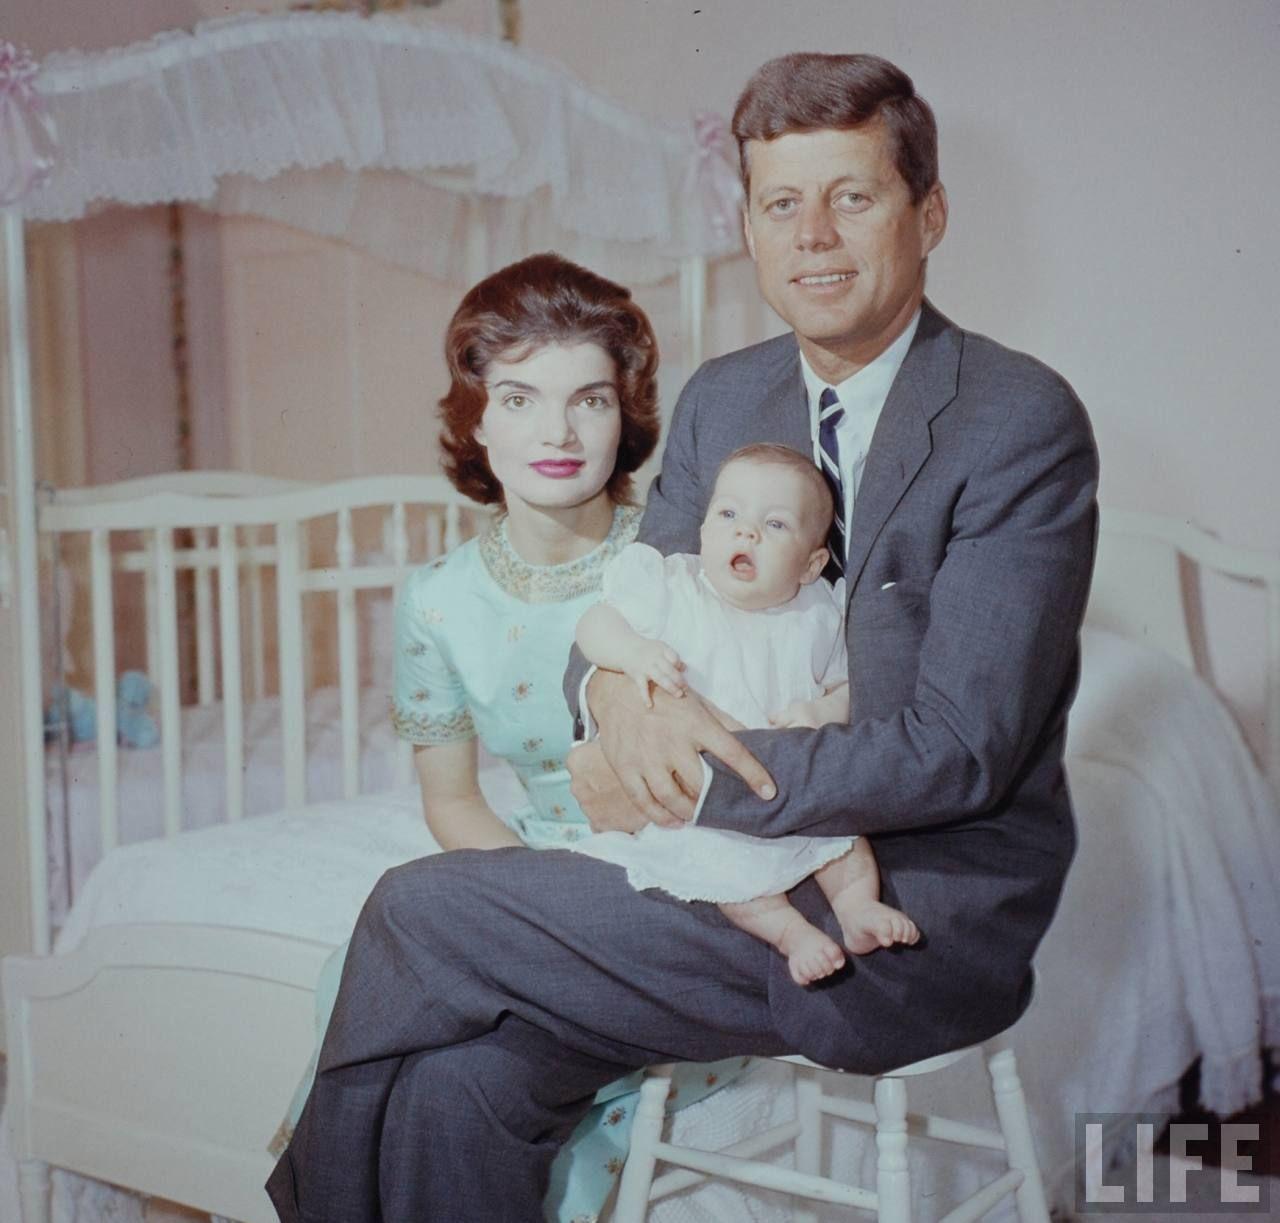 Sen. Kennedy And Baby Photographer:Nina Leen